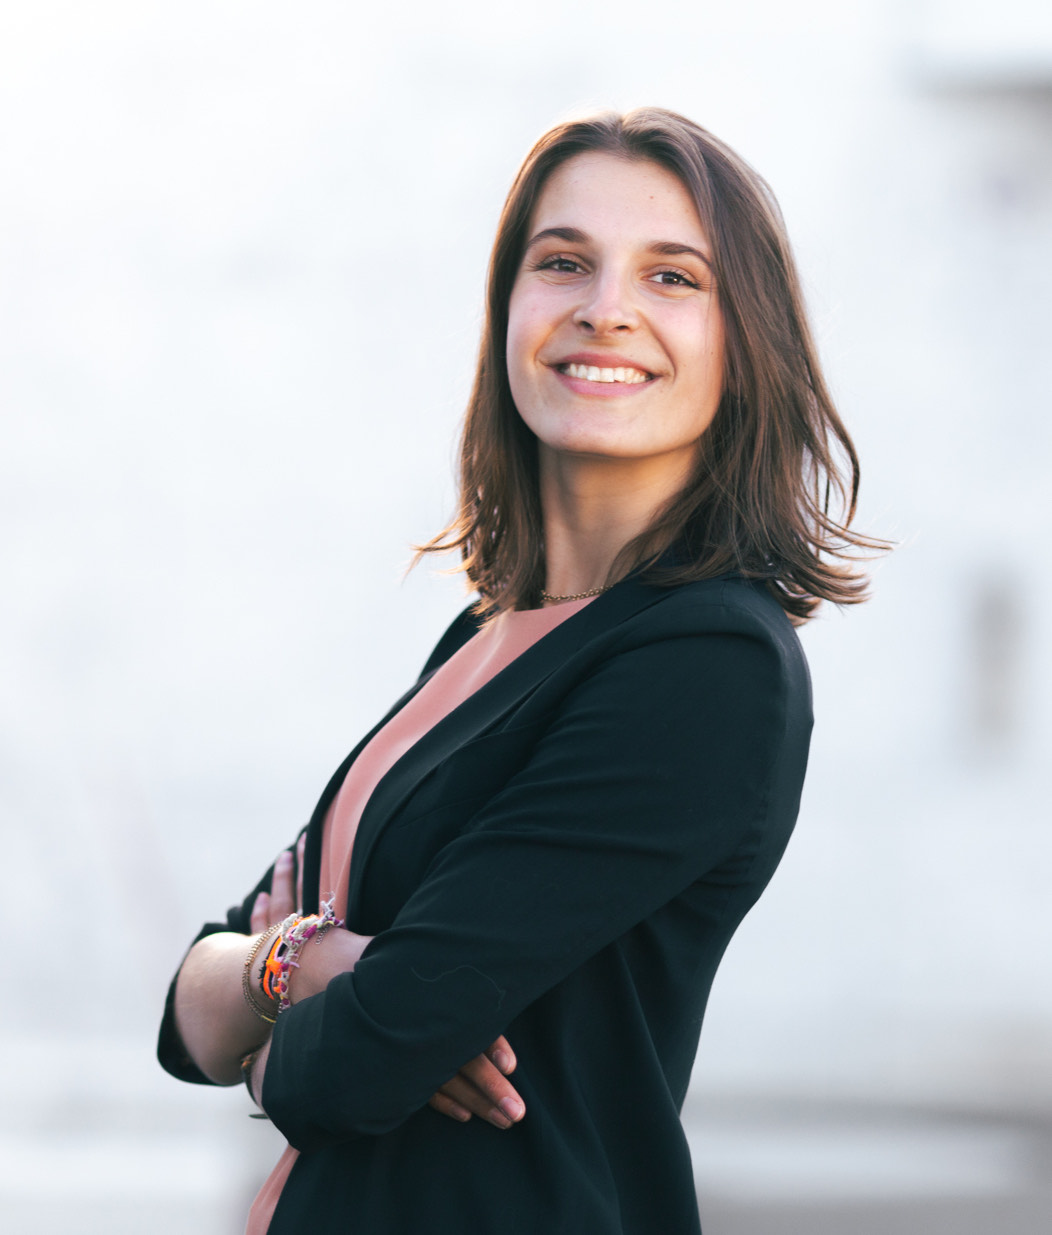 Elena Stüben